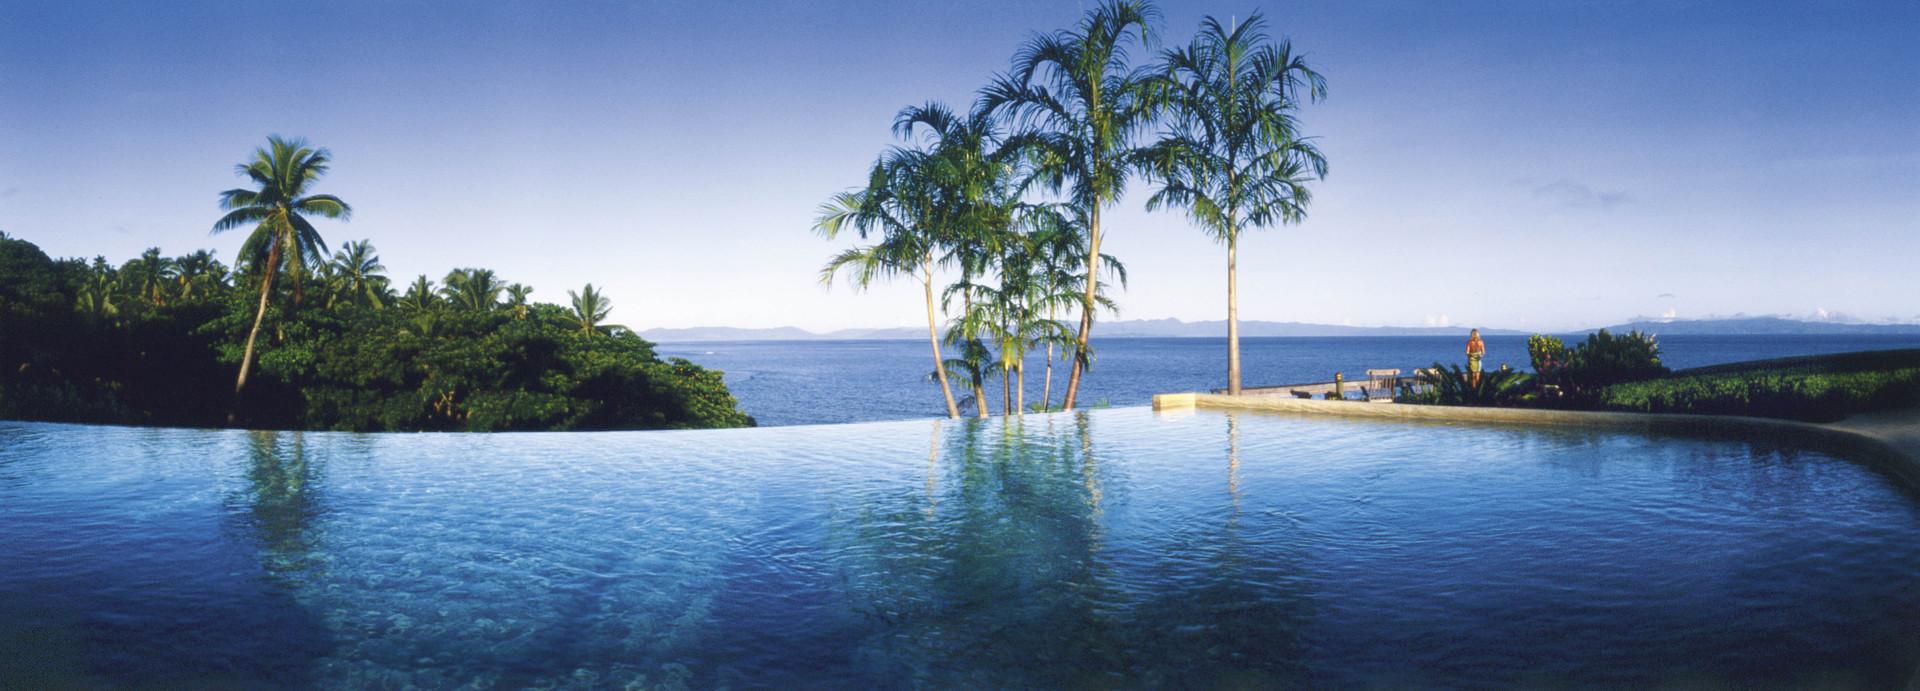 Taveuni Island Resort Amp Spa Fiji Original Diving